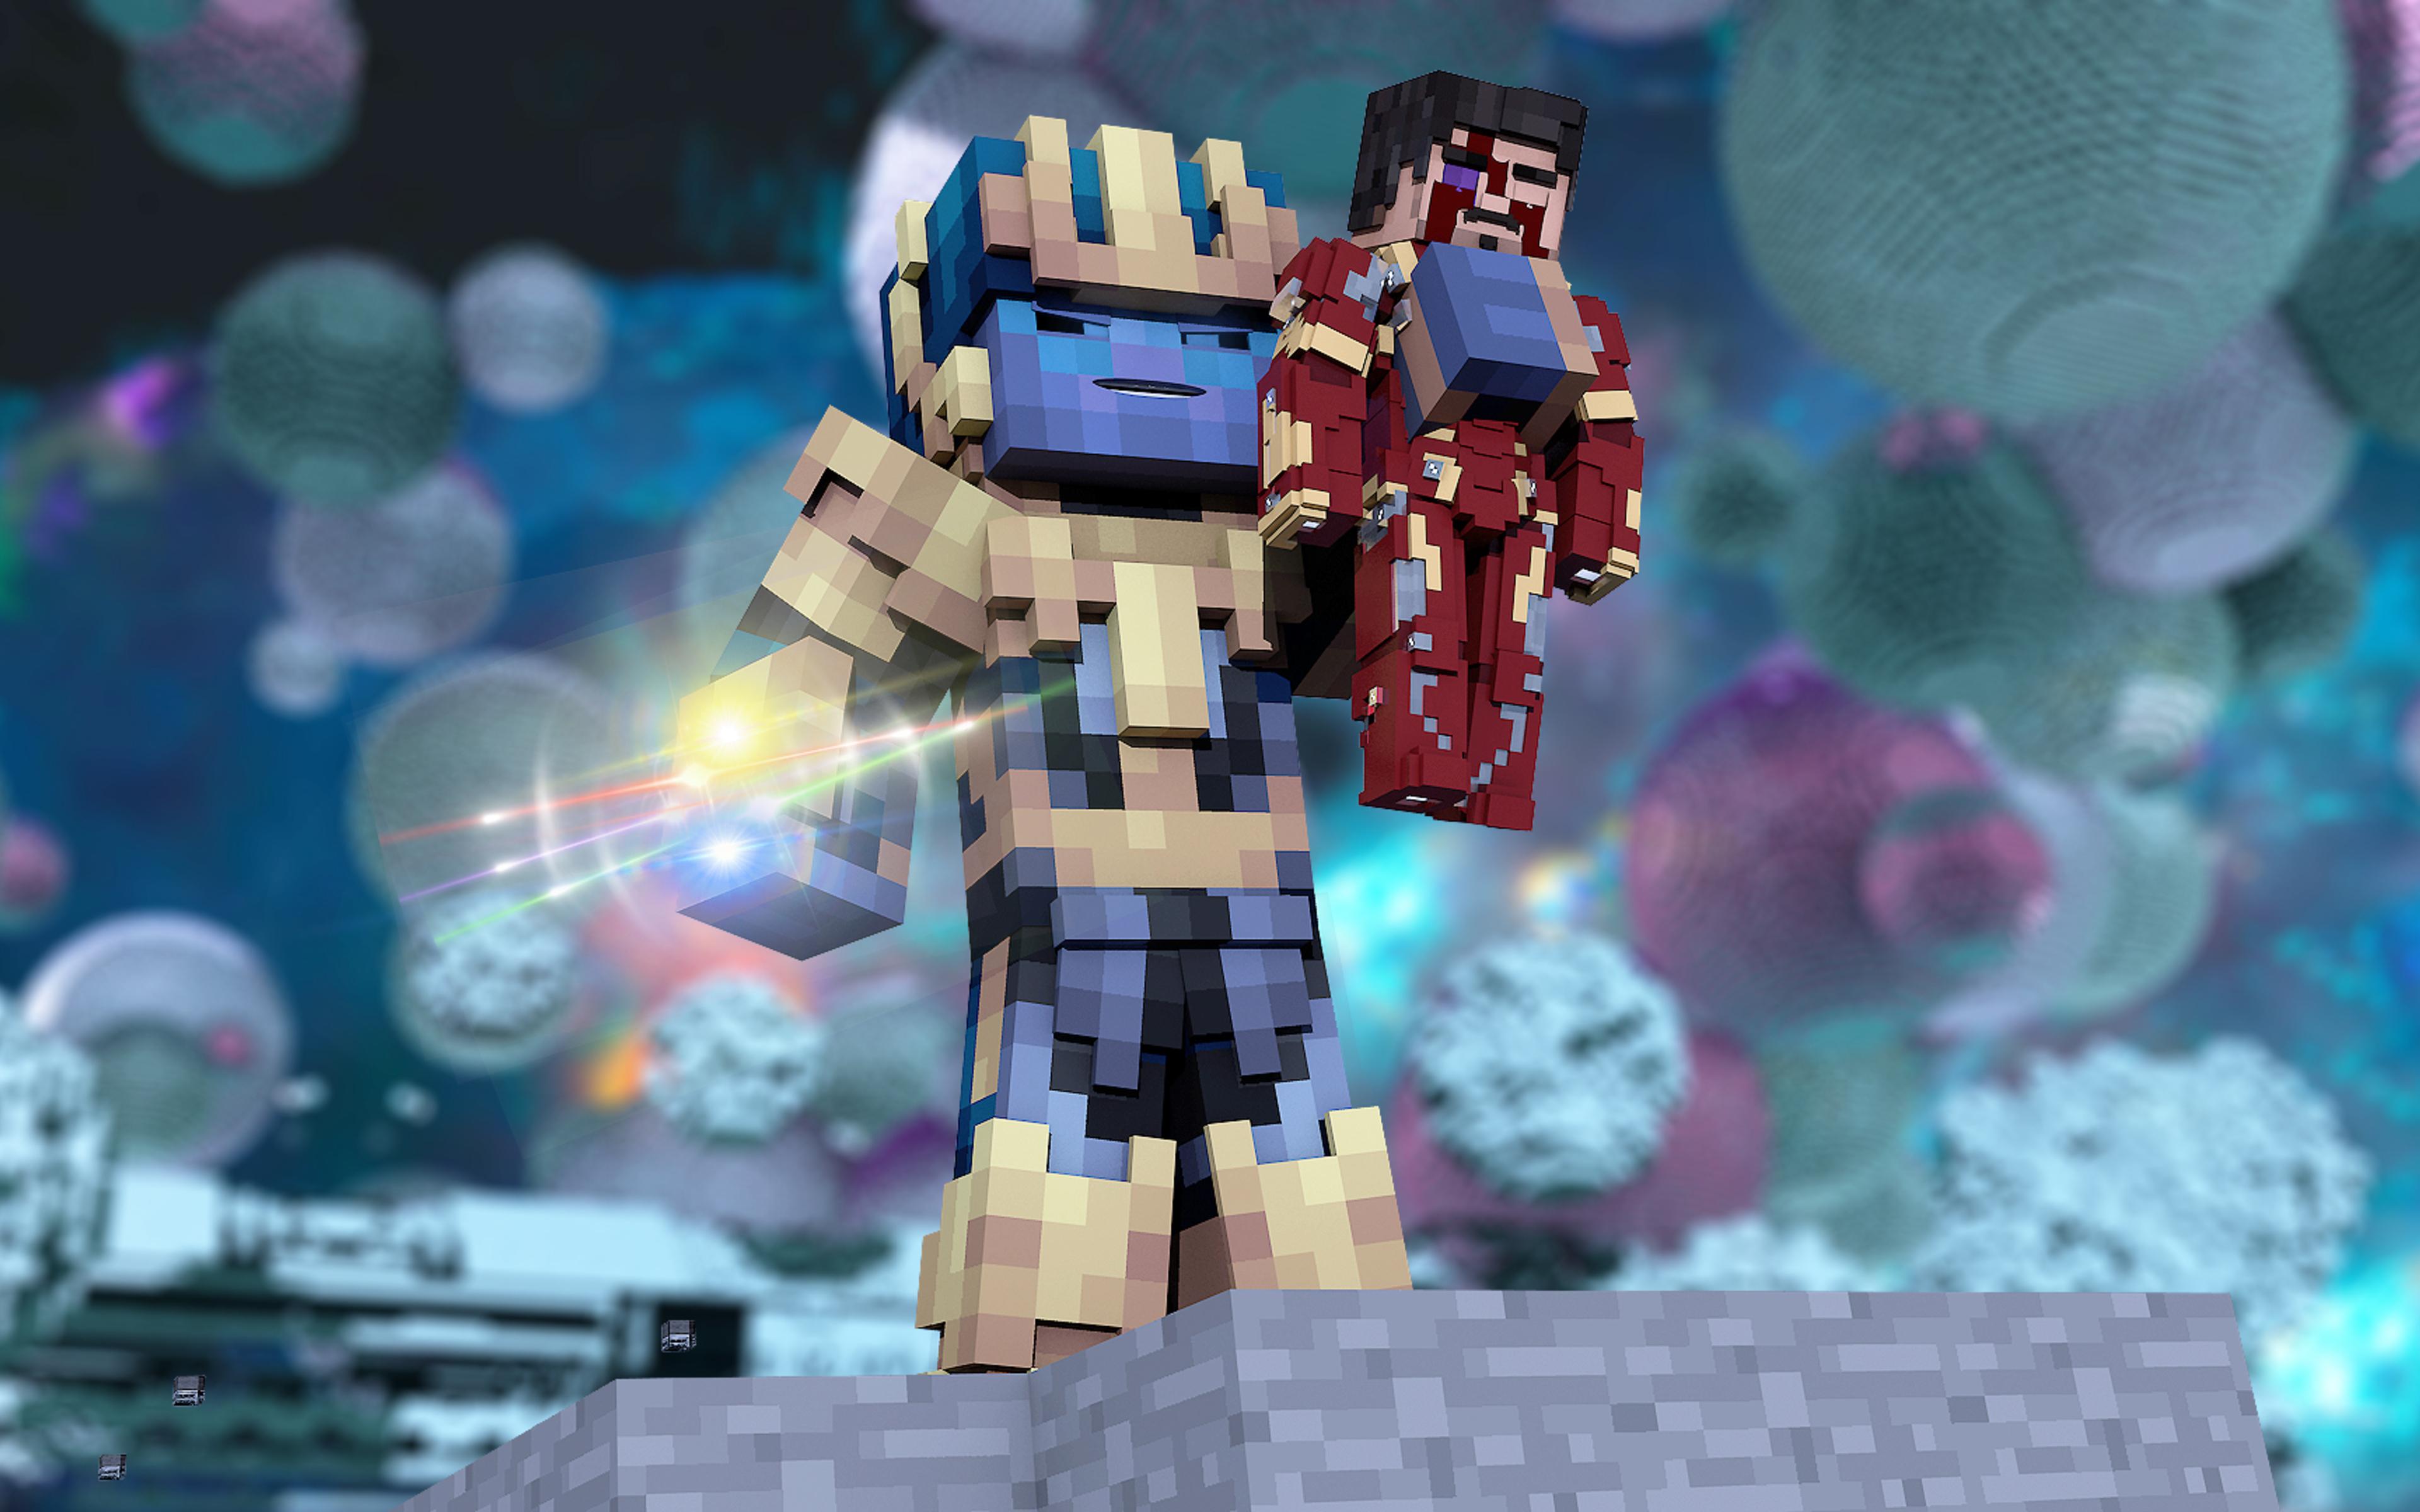 3840x2400 Thanos And Iron Man Lego Artwork 4k Hd 4k Wallpapers